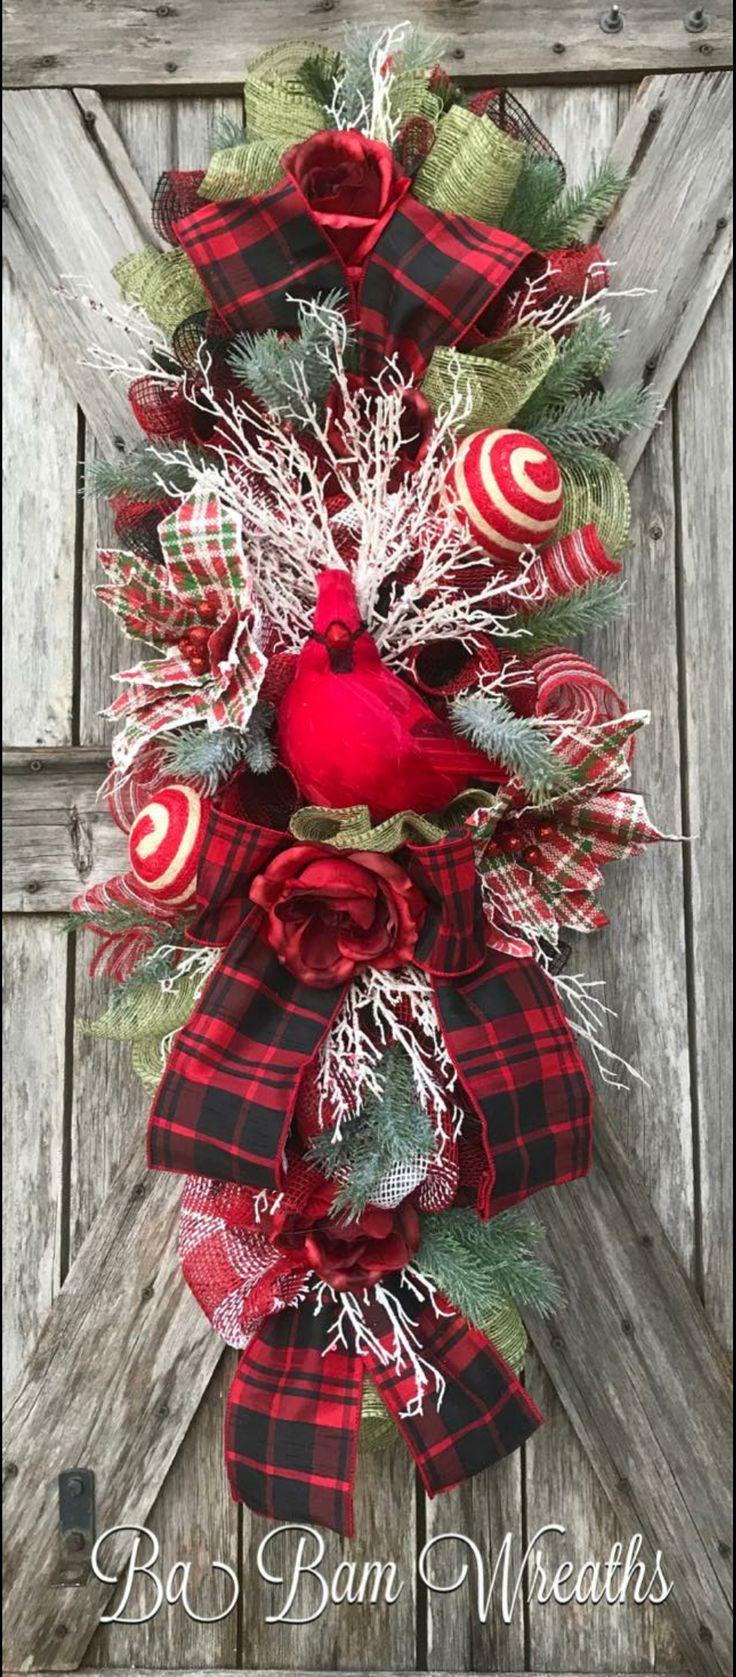 2019 Best Ba Bam Wreaths Images On Pinterest Deco Mesh